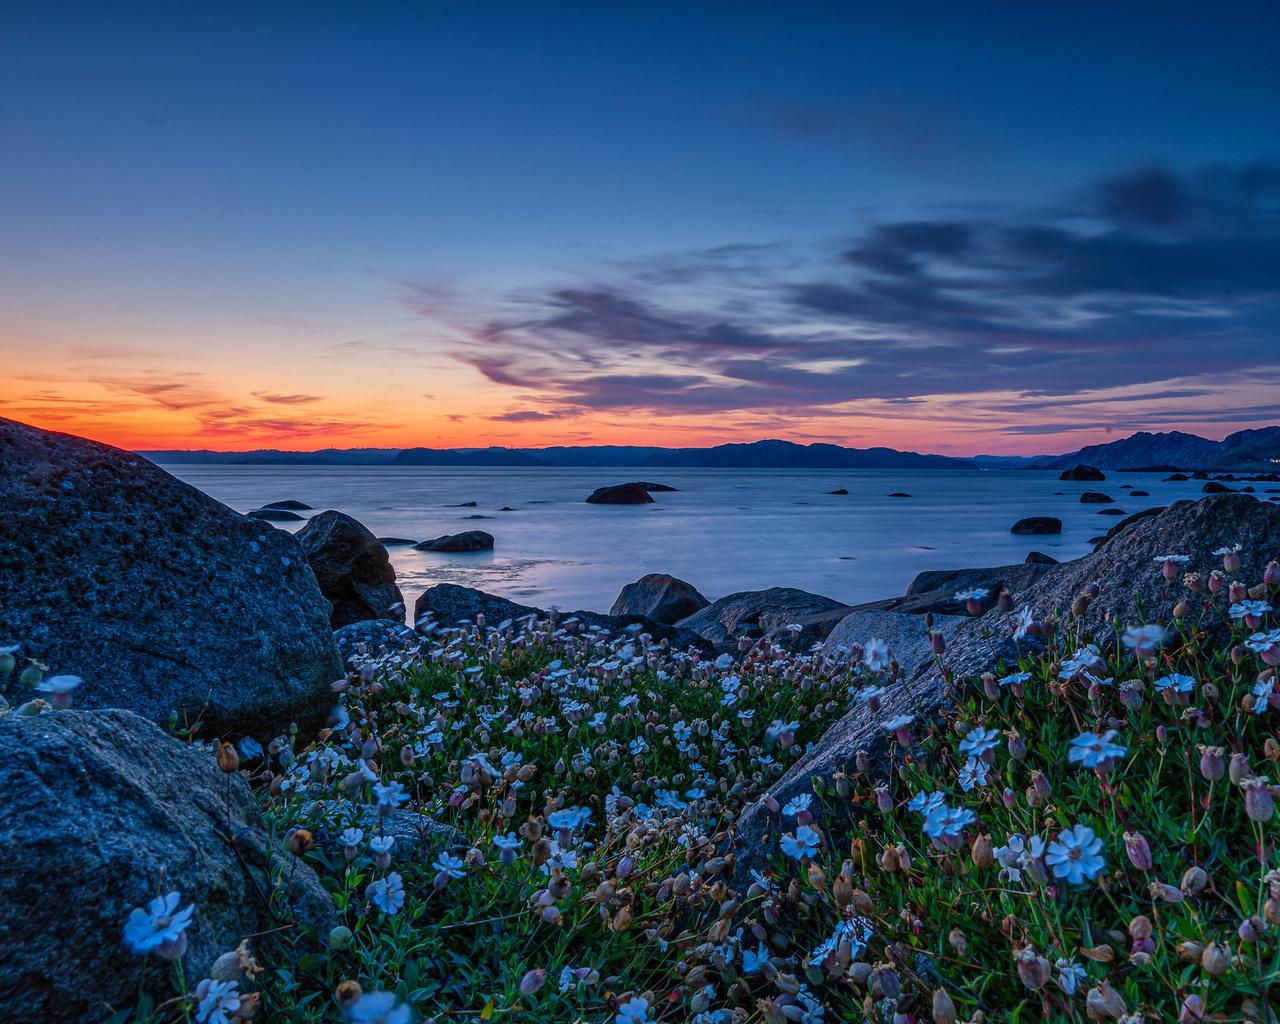 ставстё, листа, норвегия, море